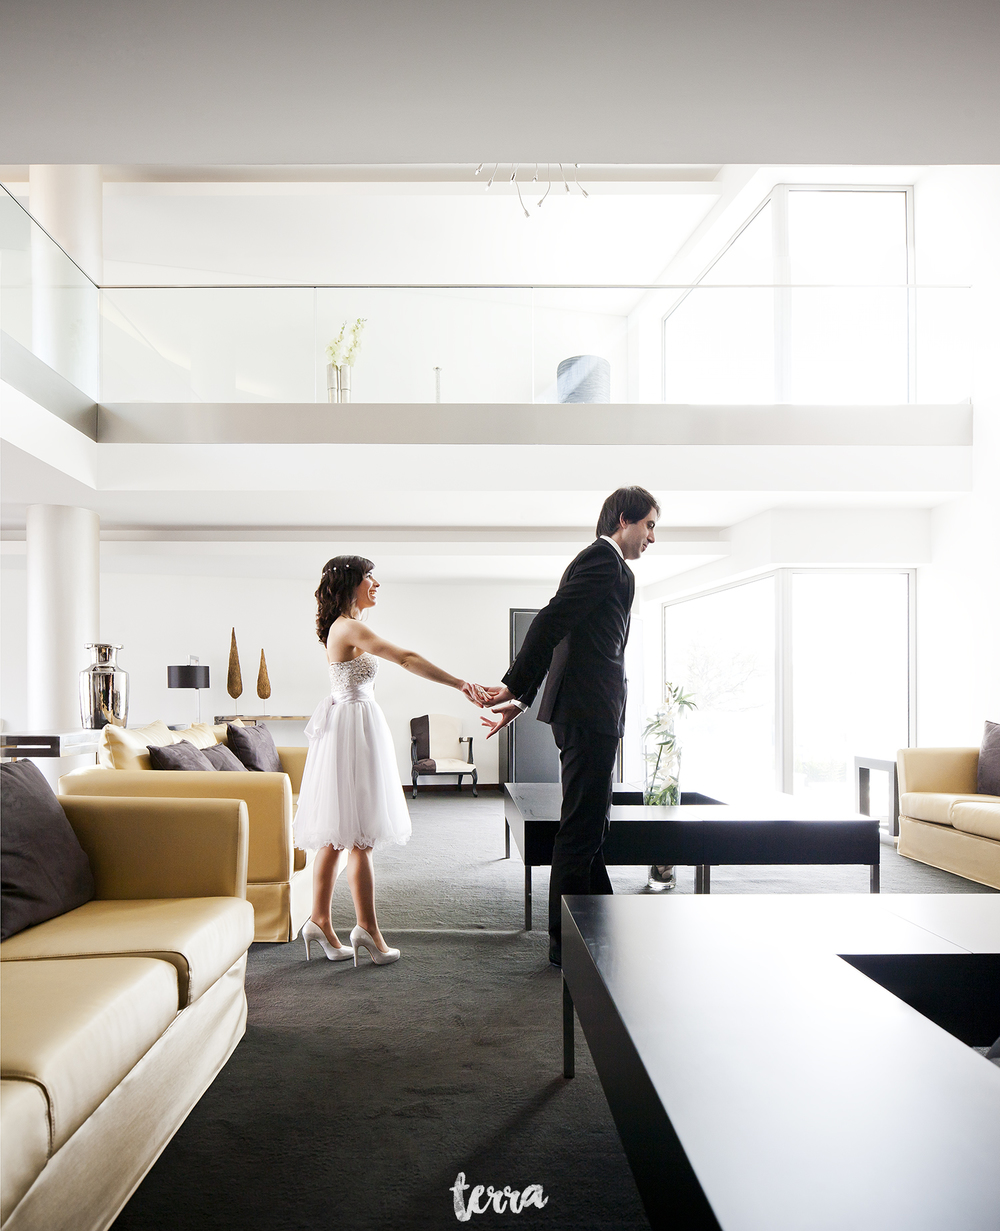 casamento-monte-real-termas-hotel-spa-terra-fotografia-0015.jpg